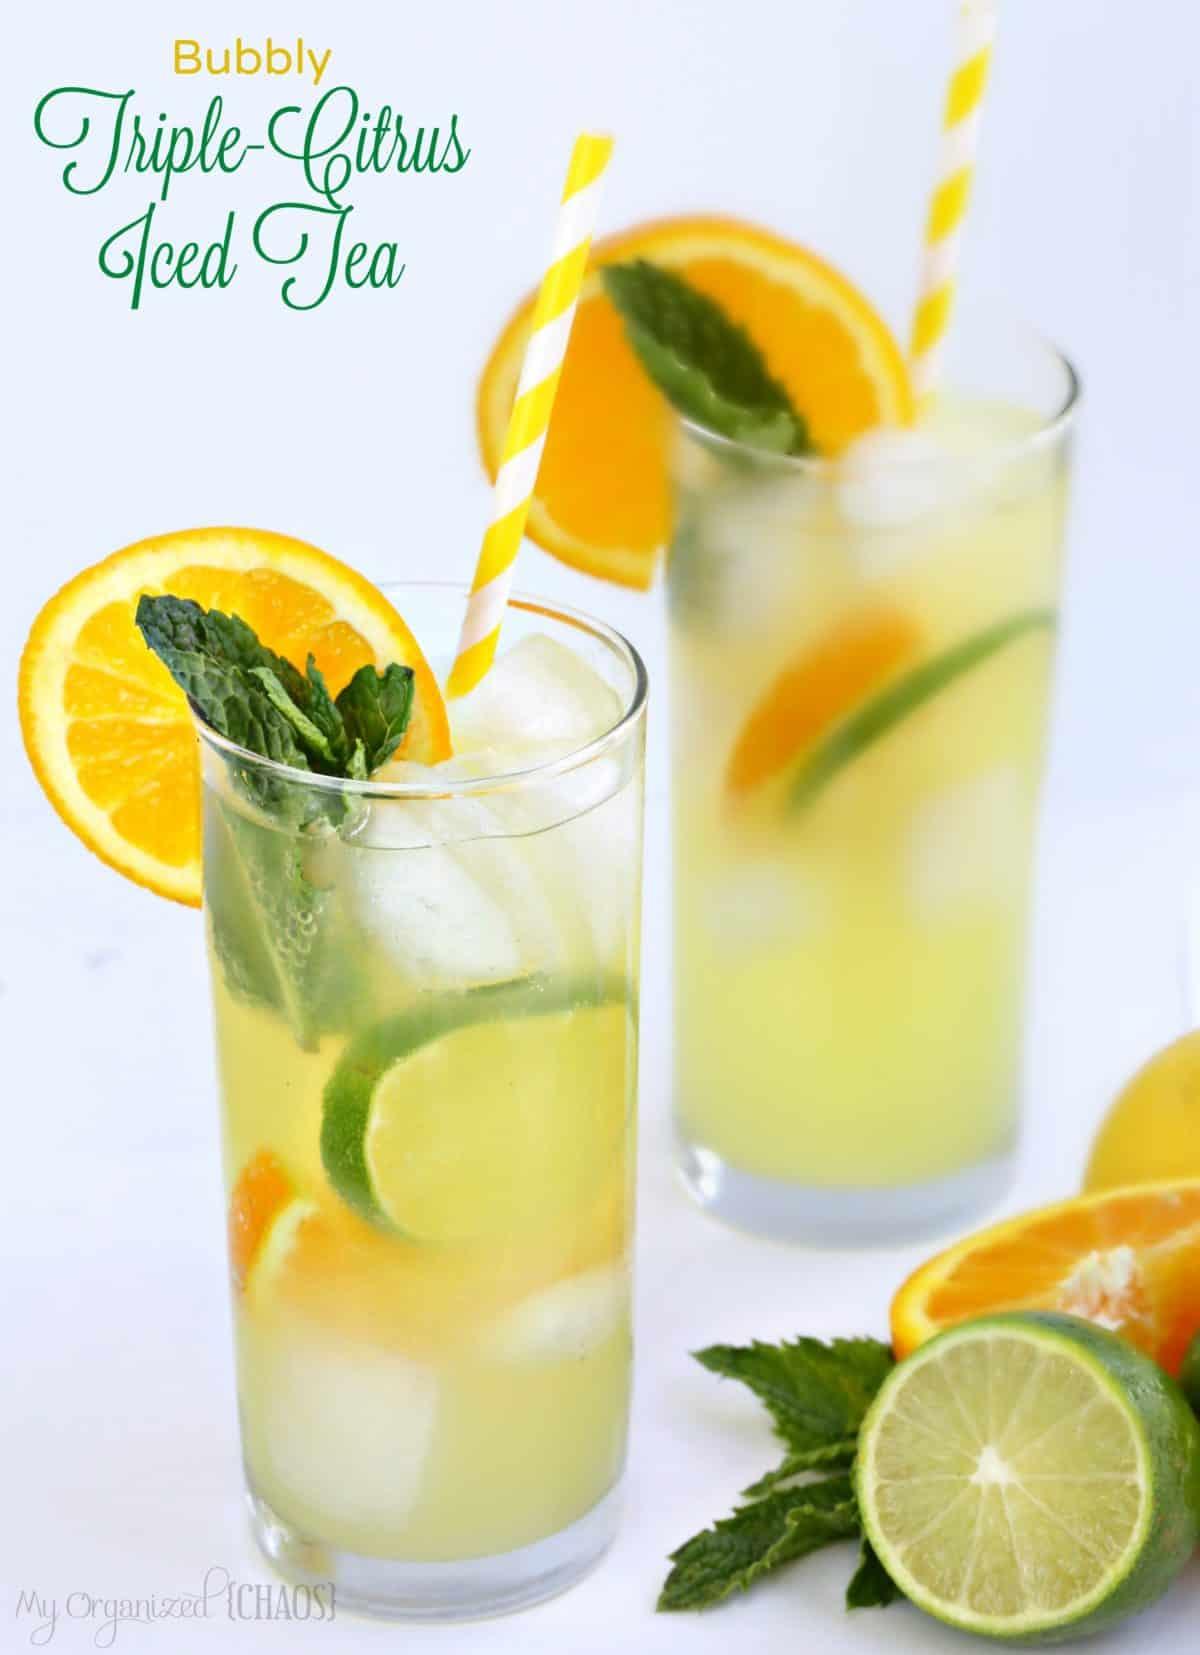 Bubbly Triple-Citrus Iced Tea